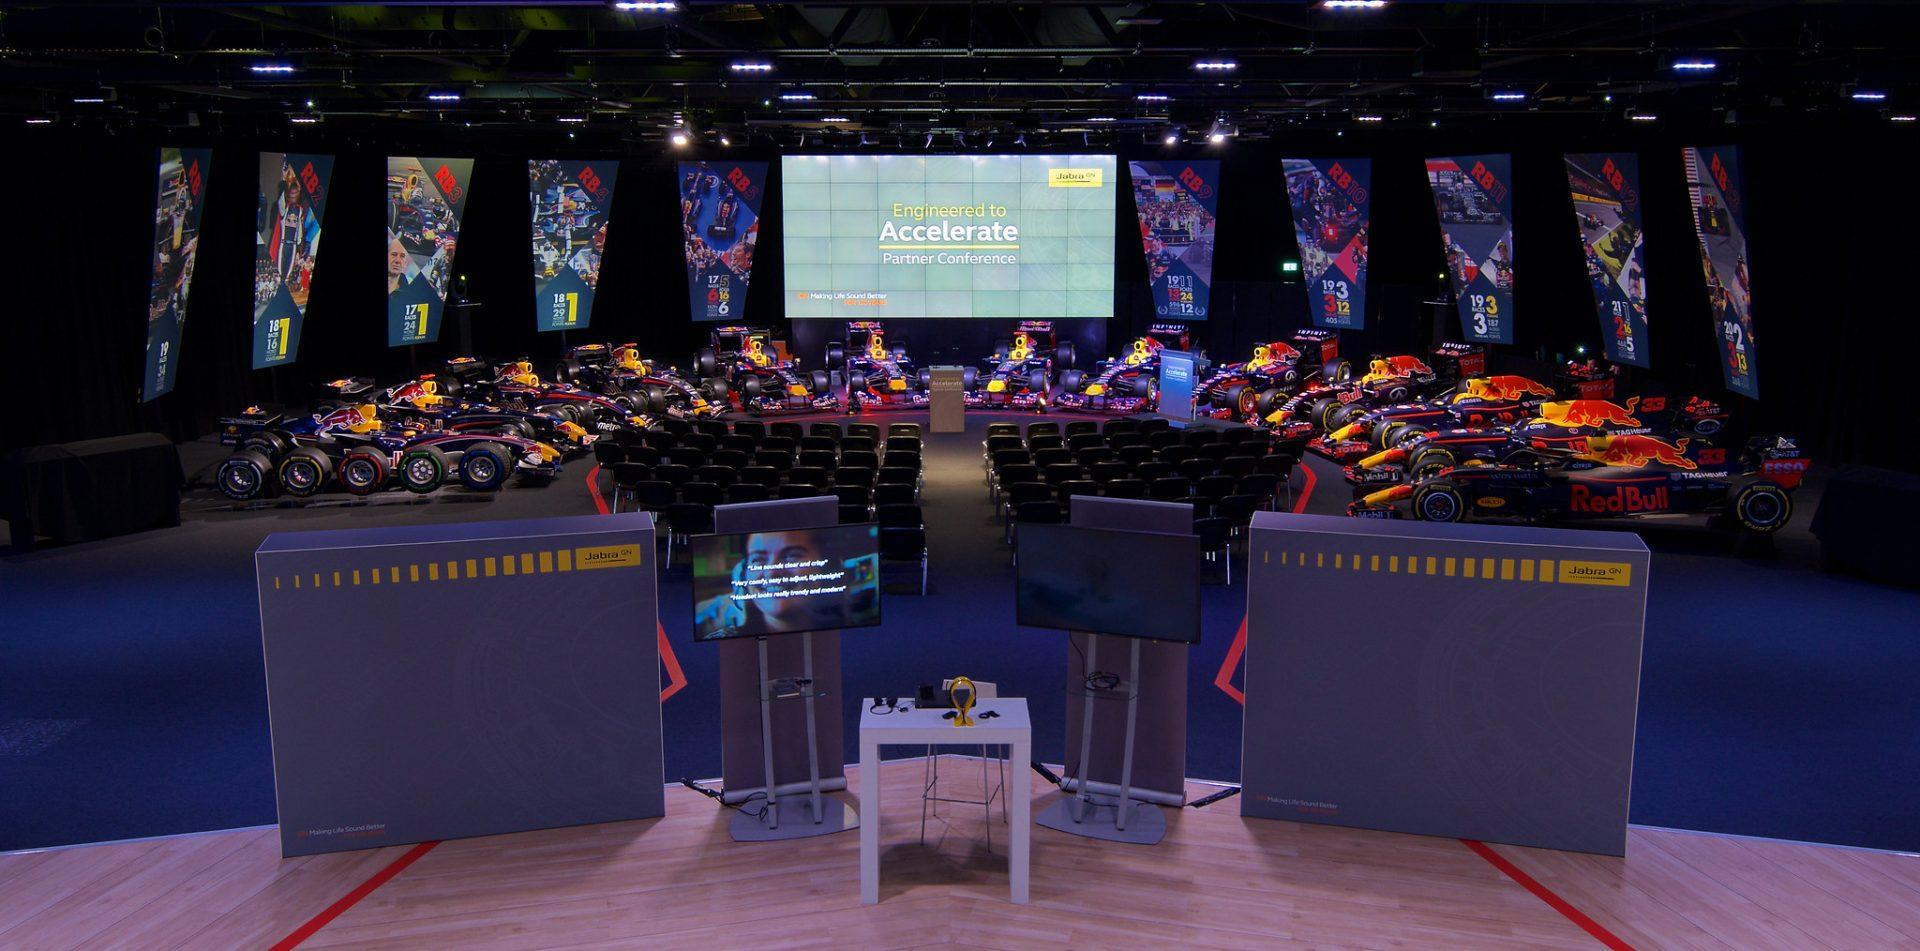 i 5GWHsDz X4 1 - UK&I Channel Partner Conference & Awards Dinner